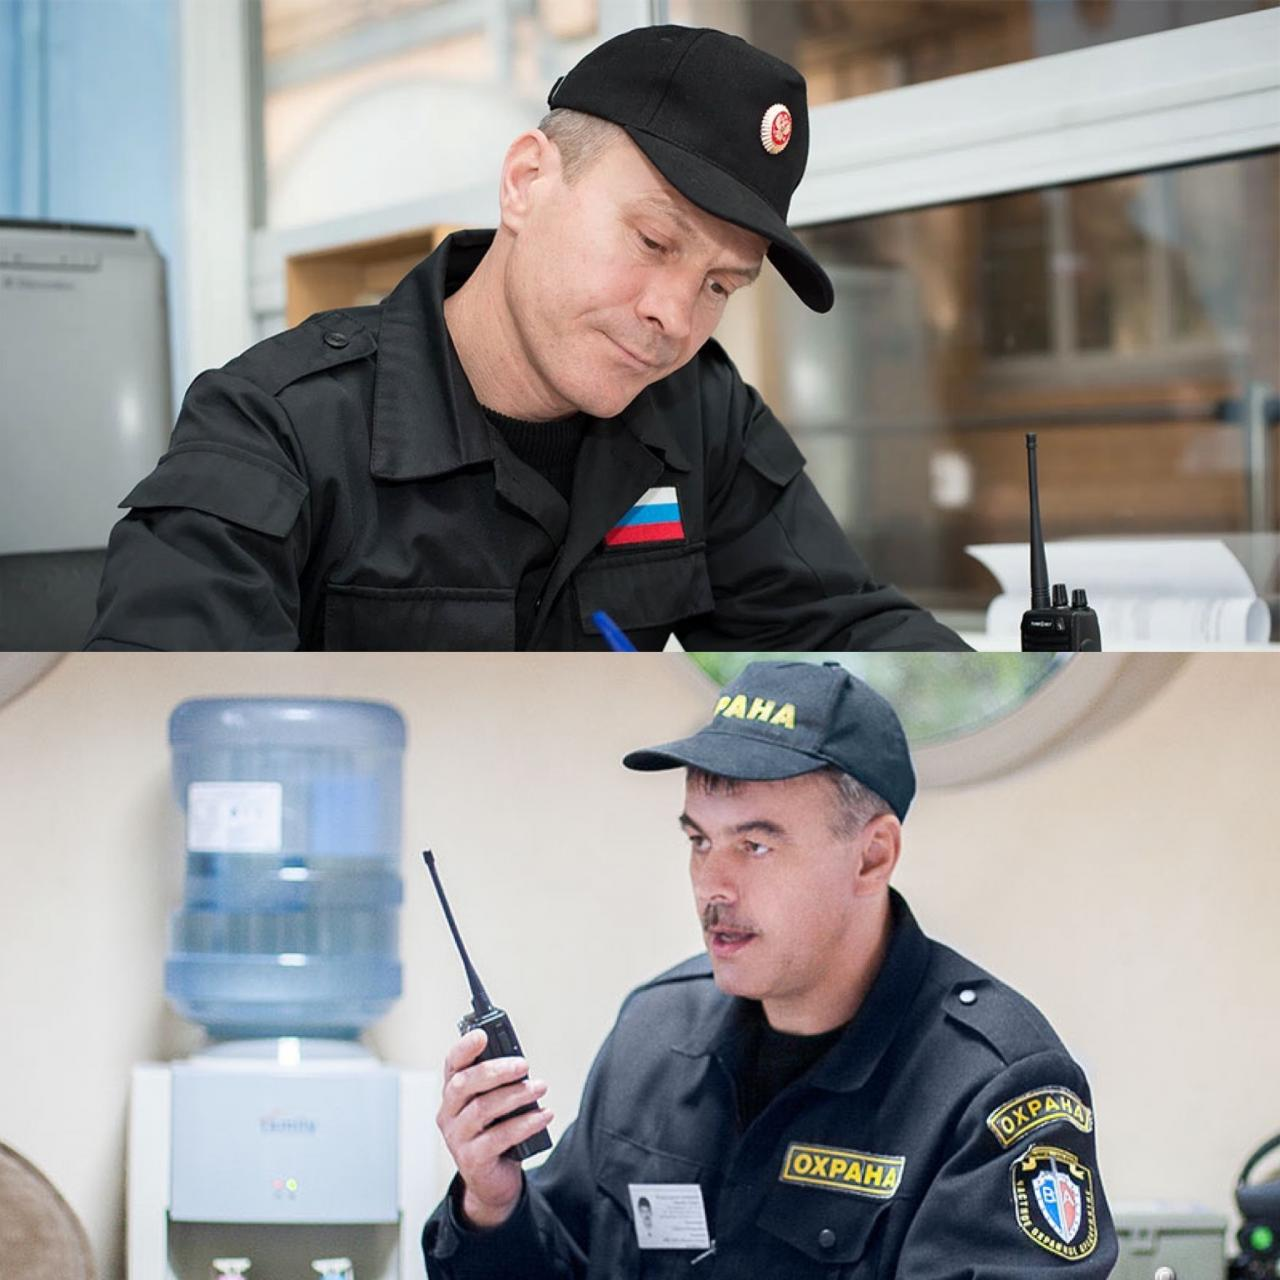 Охранник, мужчина 35-50 лет